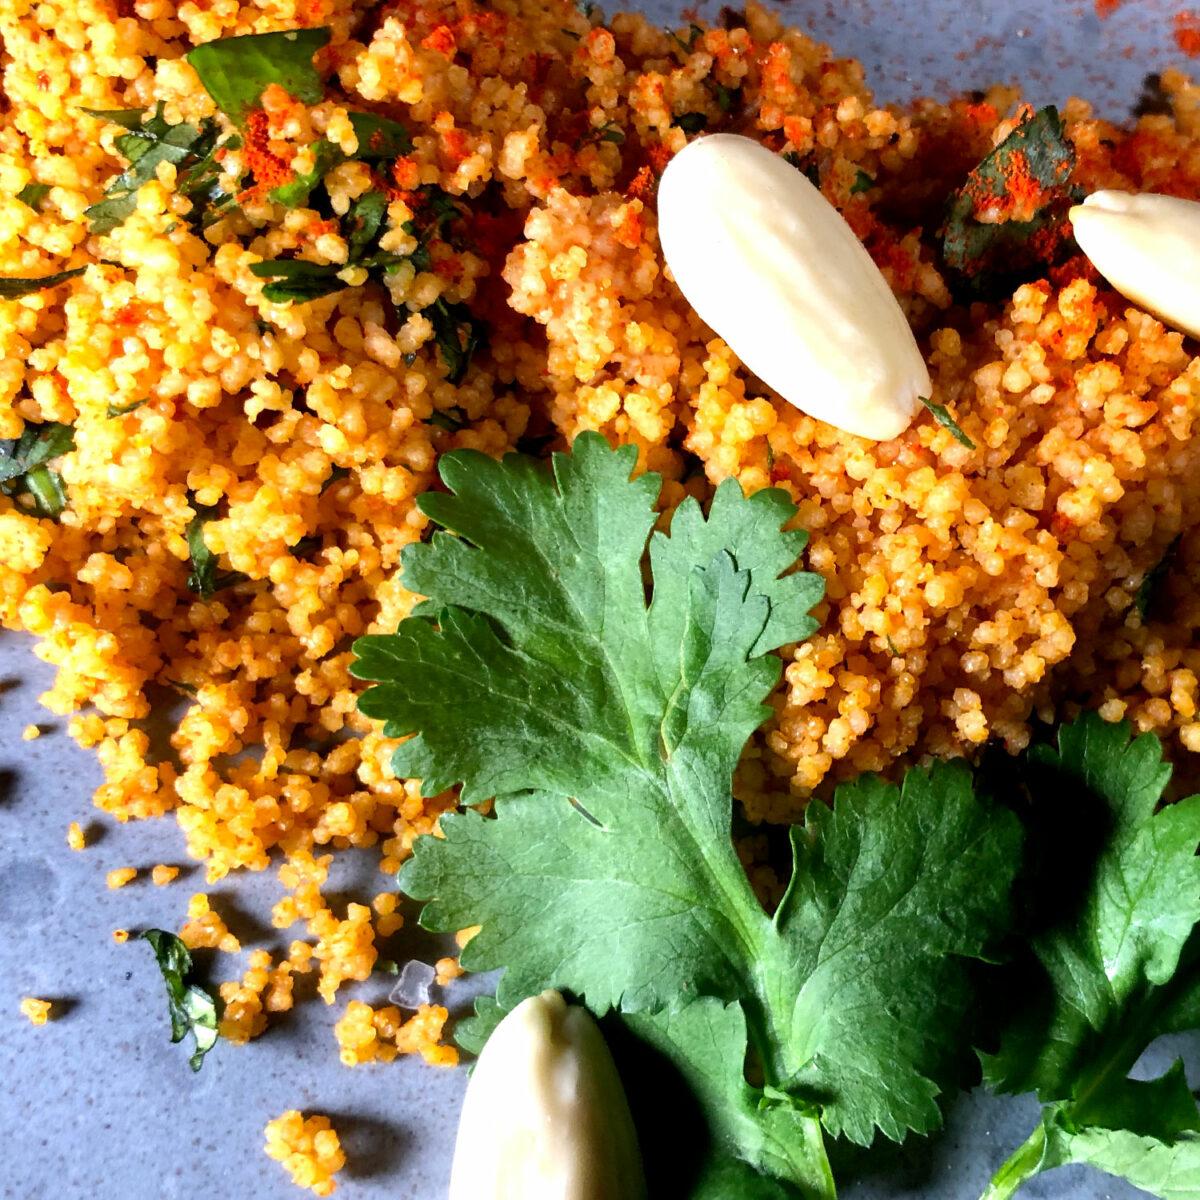 Couscous orientalisch gewürzt